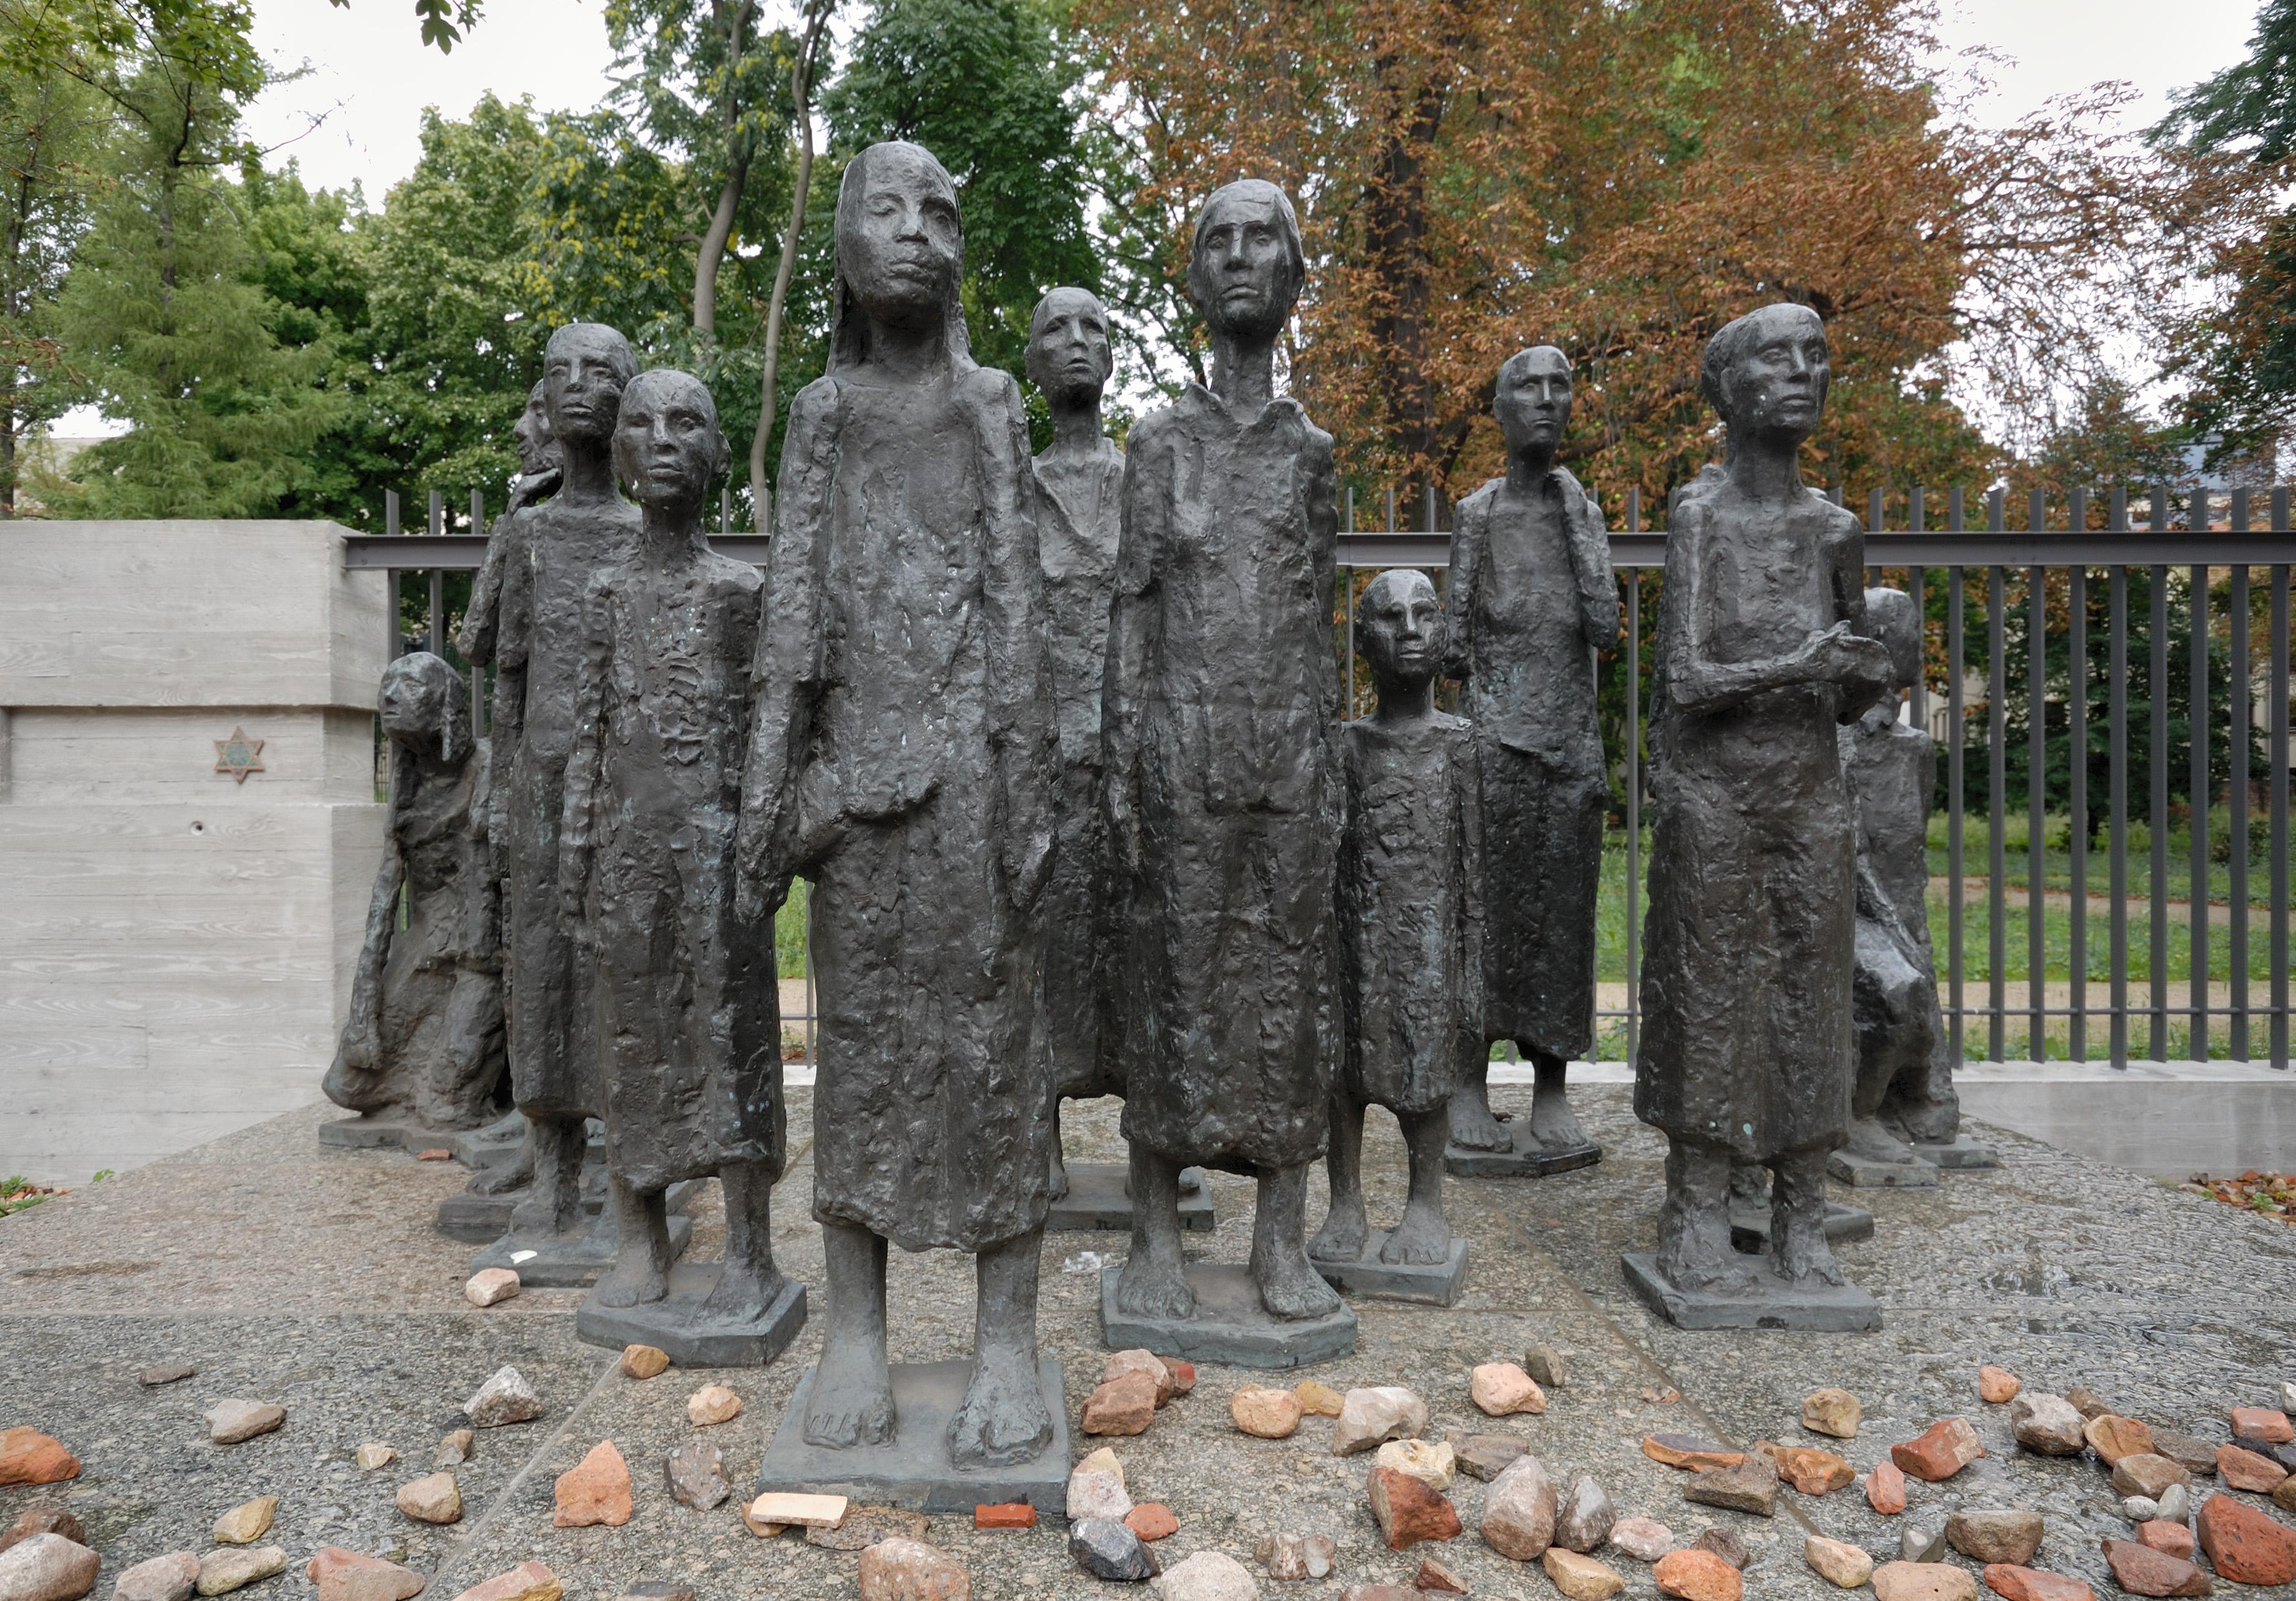 Scheunenviertel: «Η γειτονιά των αχυρώνων» στο Βερολίνο ...εκεί ζούσαν οι Εβραίοι από το 1737 και μετά